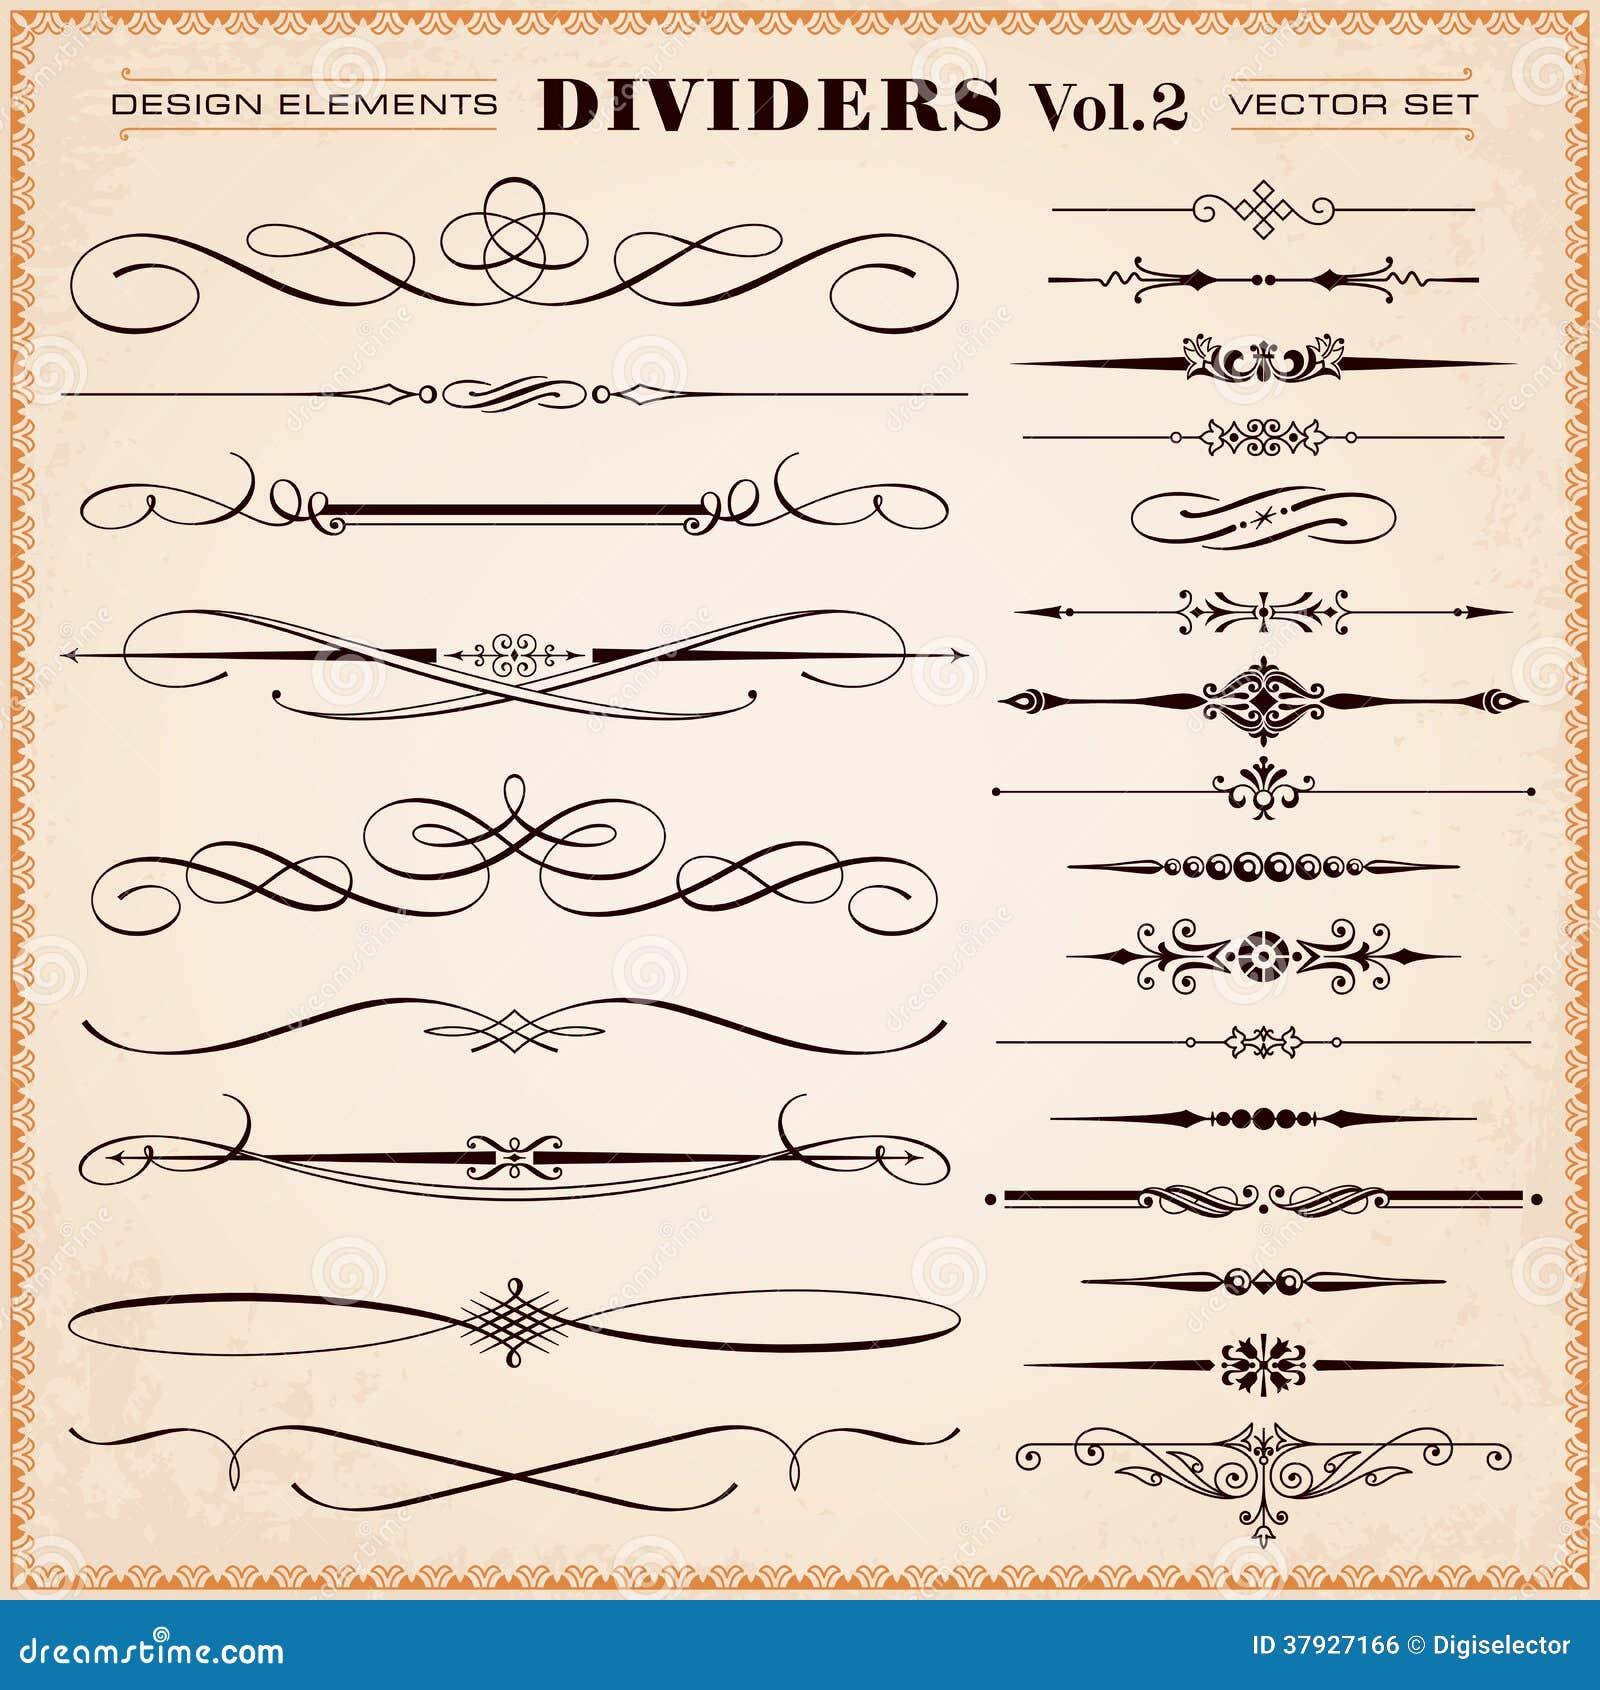 Calligraphic Design Elements Dividers Dashes Set Vector Vintage Page Decoration Retro Typographic